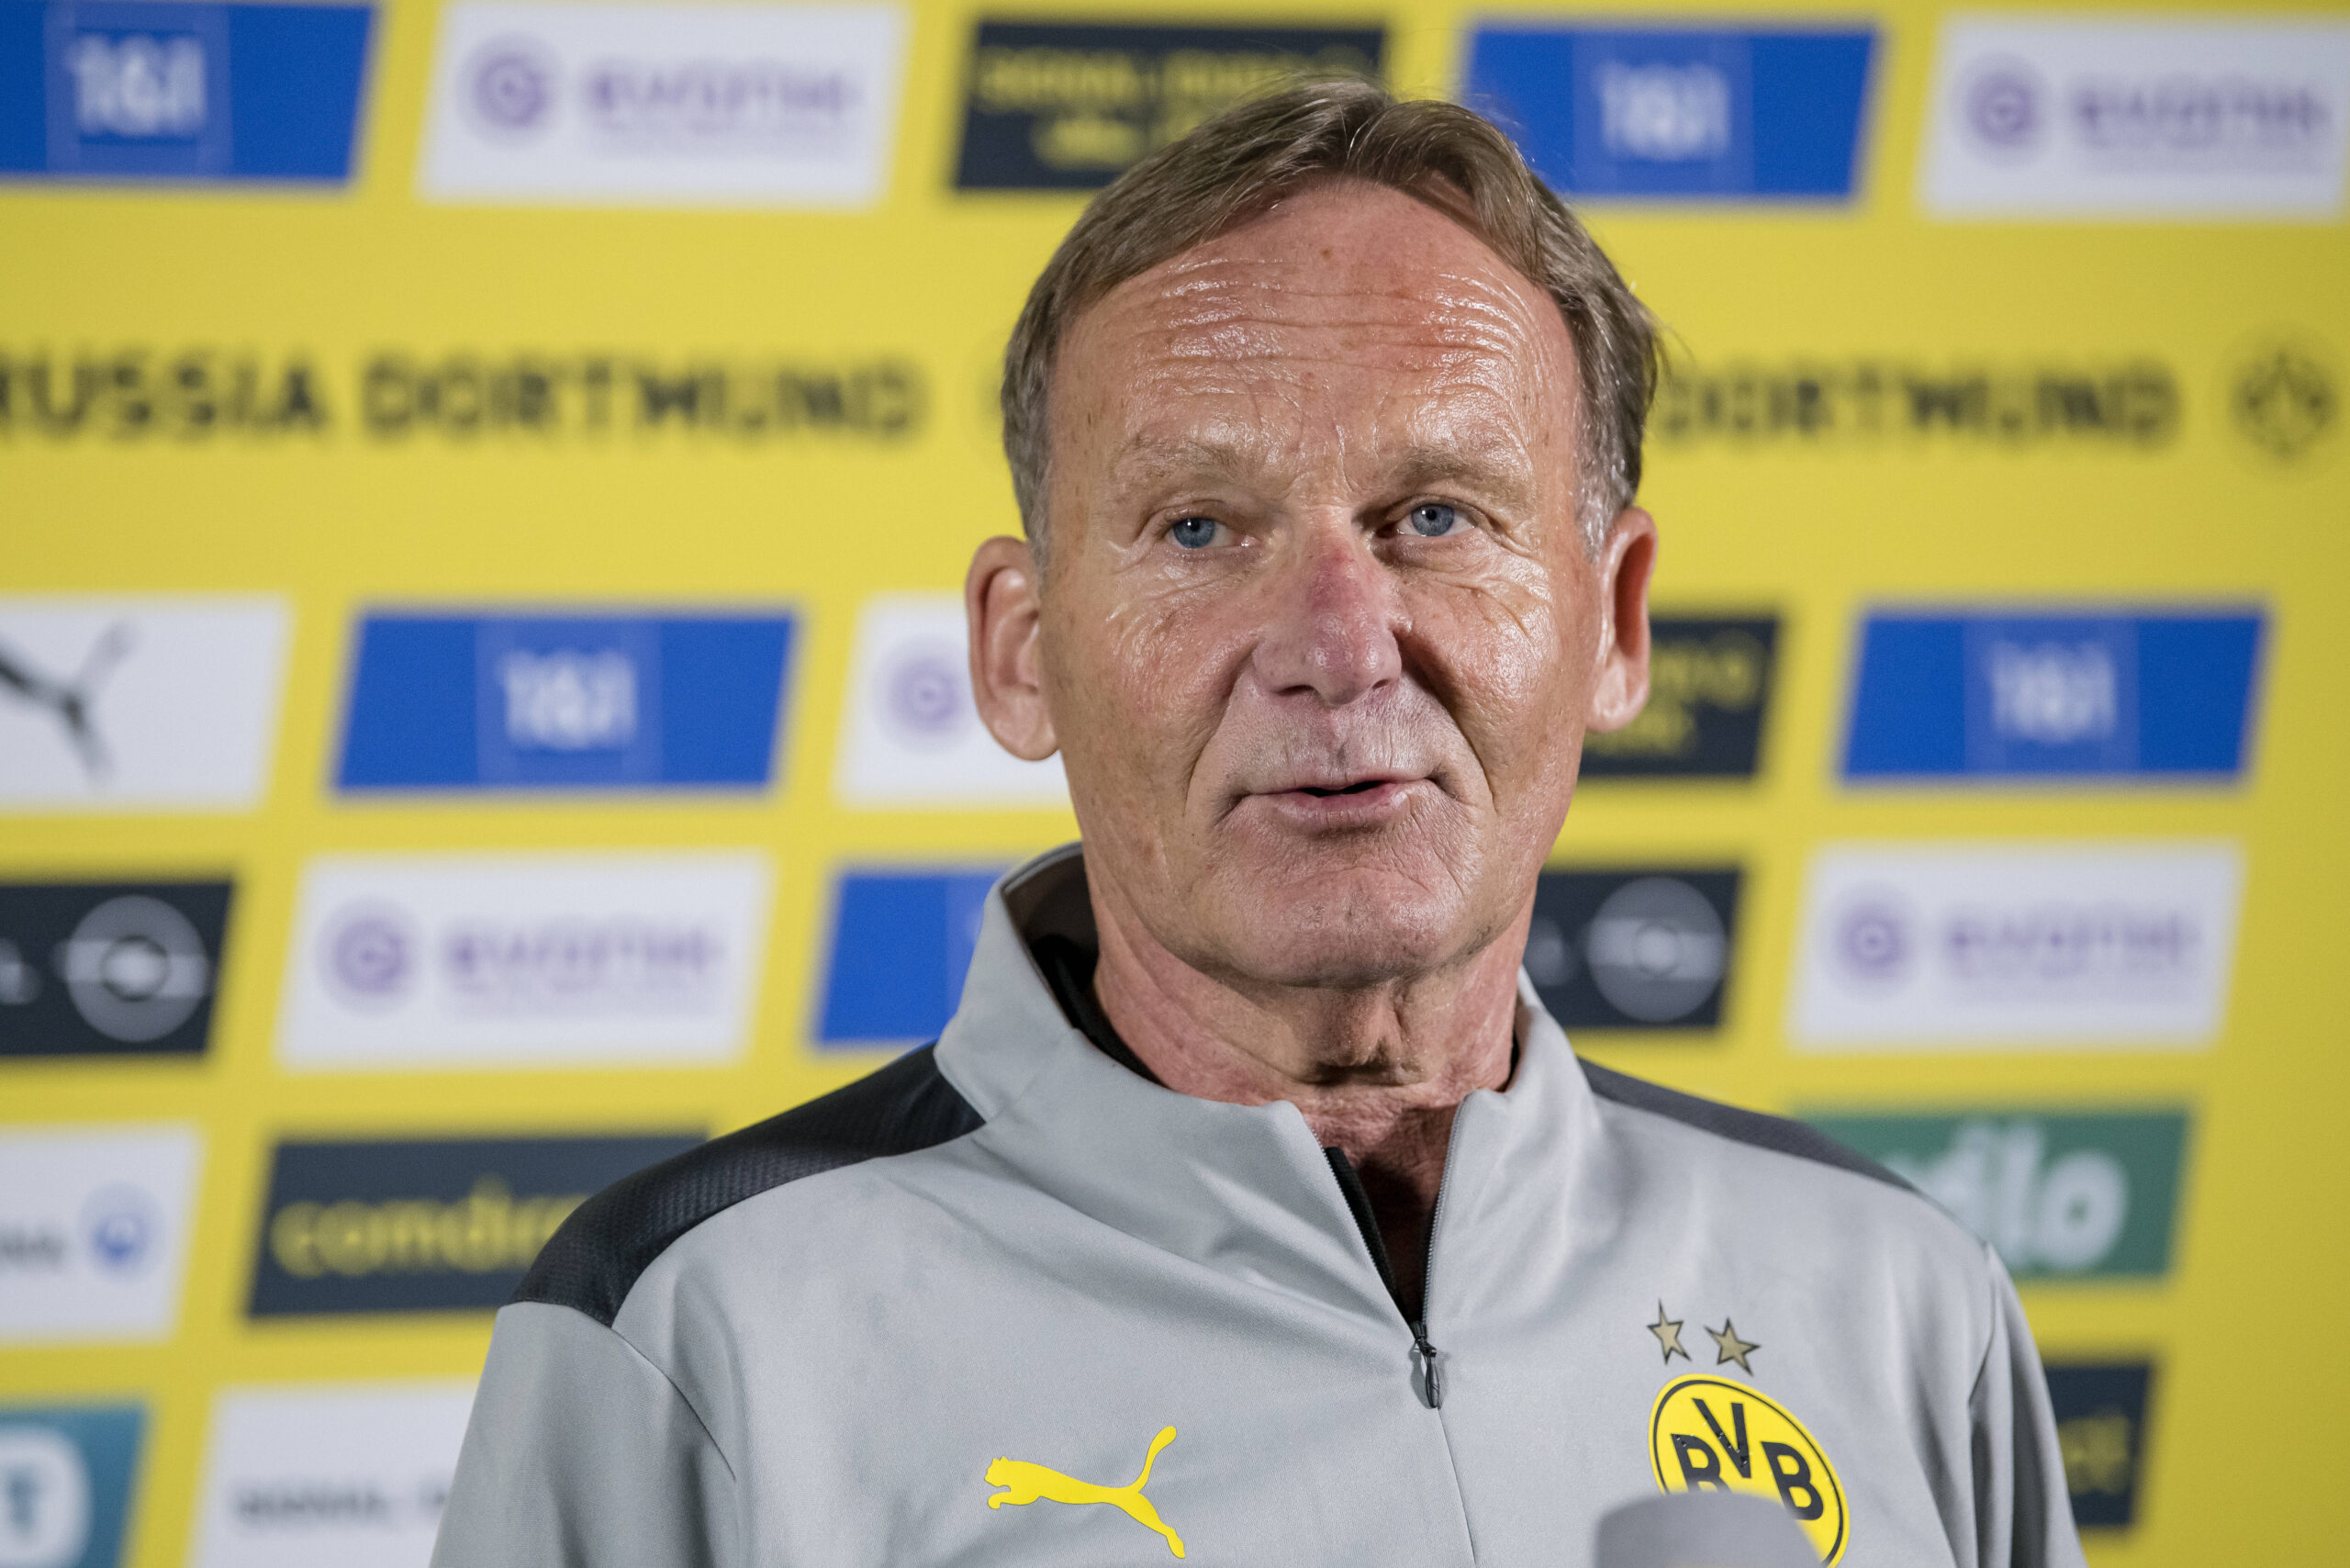 CEO Dortmund